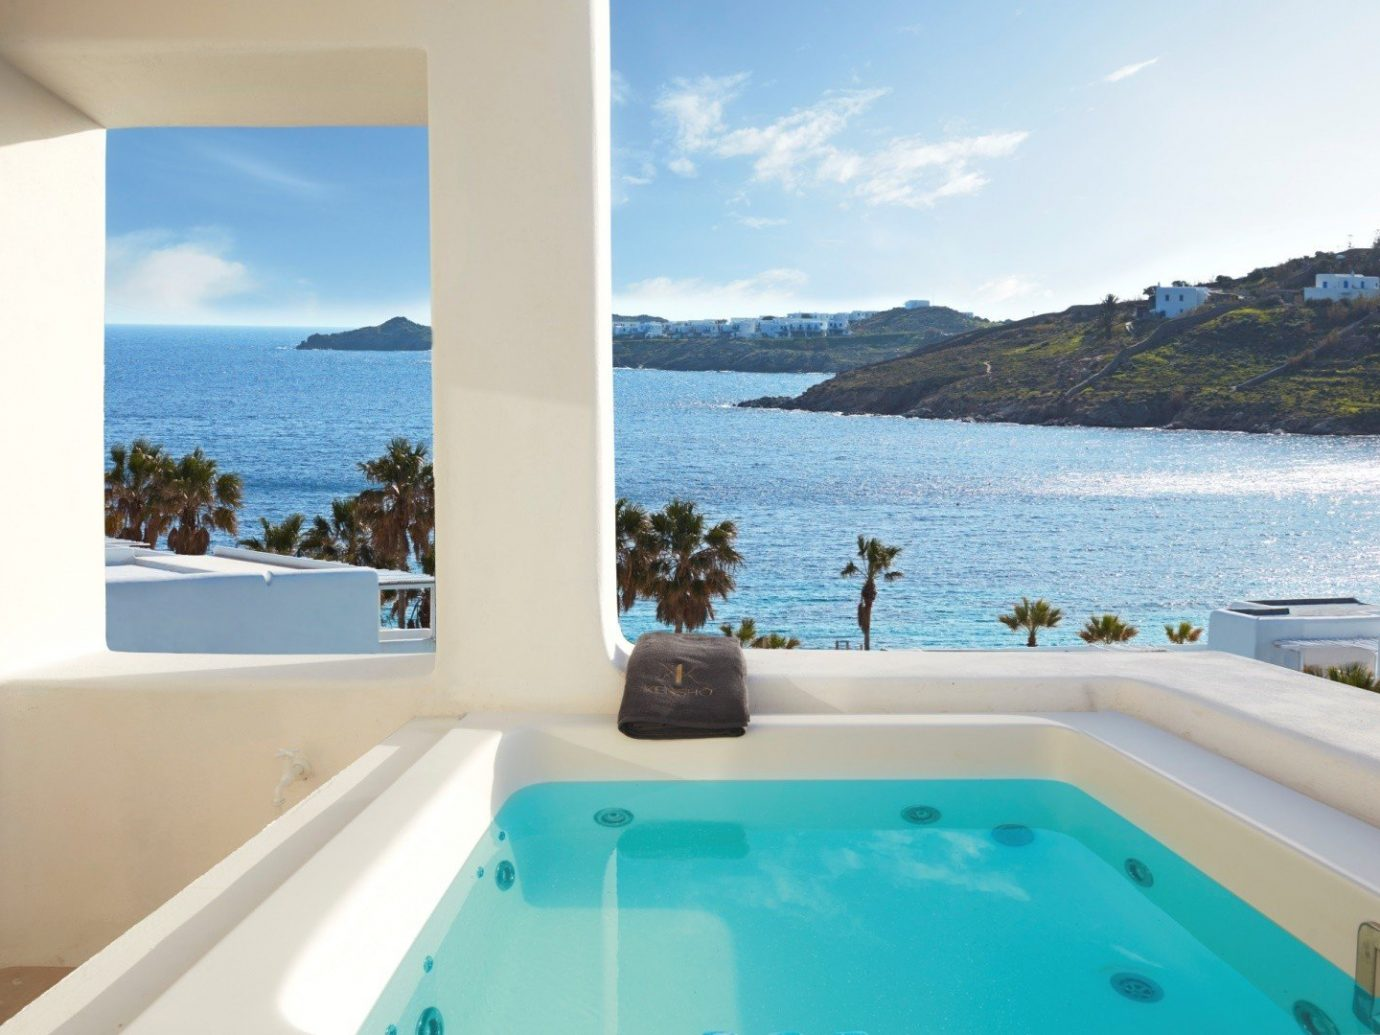 Hotels water sky swimming pool property window vacation leisure caribbean overlooking Ocean Villa estate Resort bathtub real estate Island day